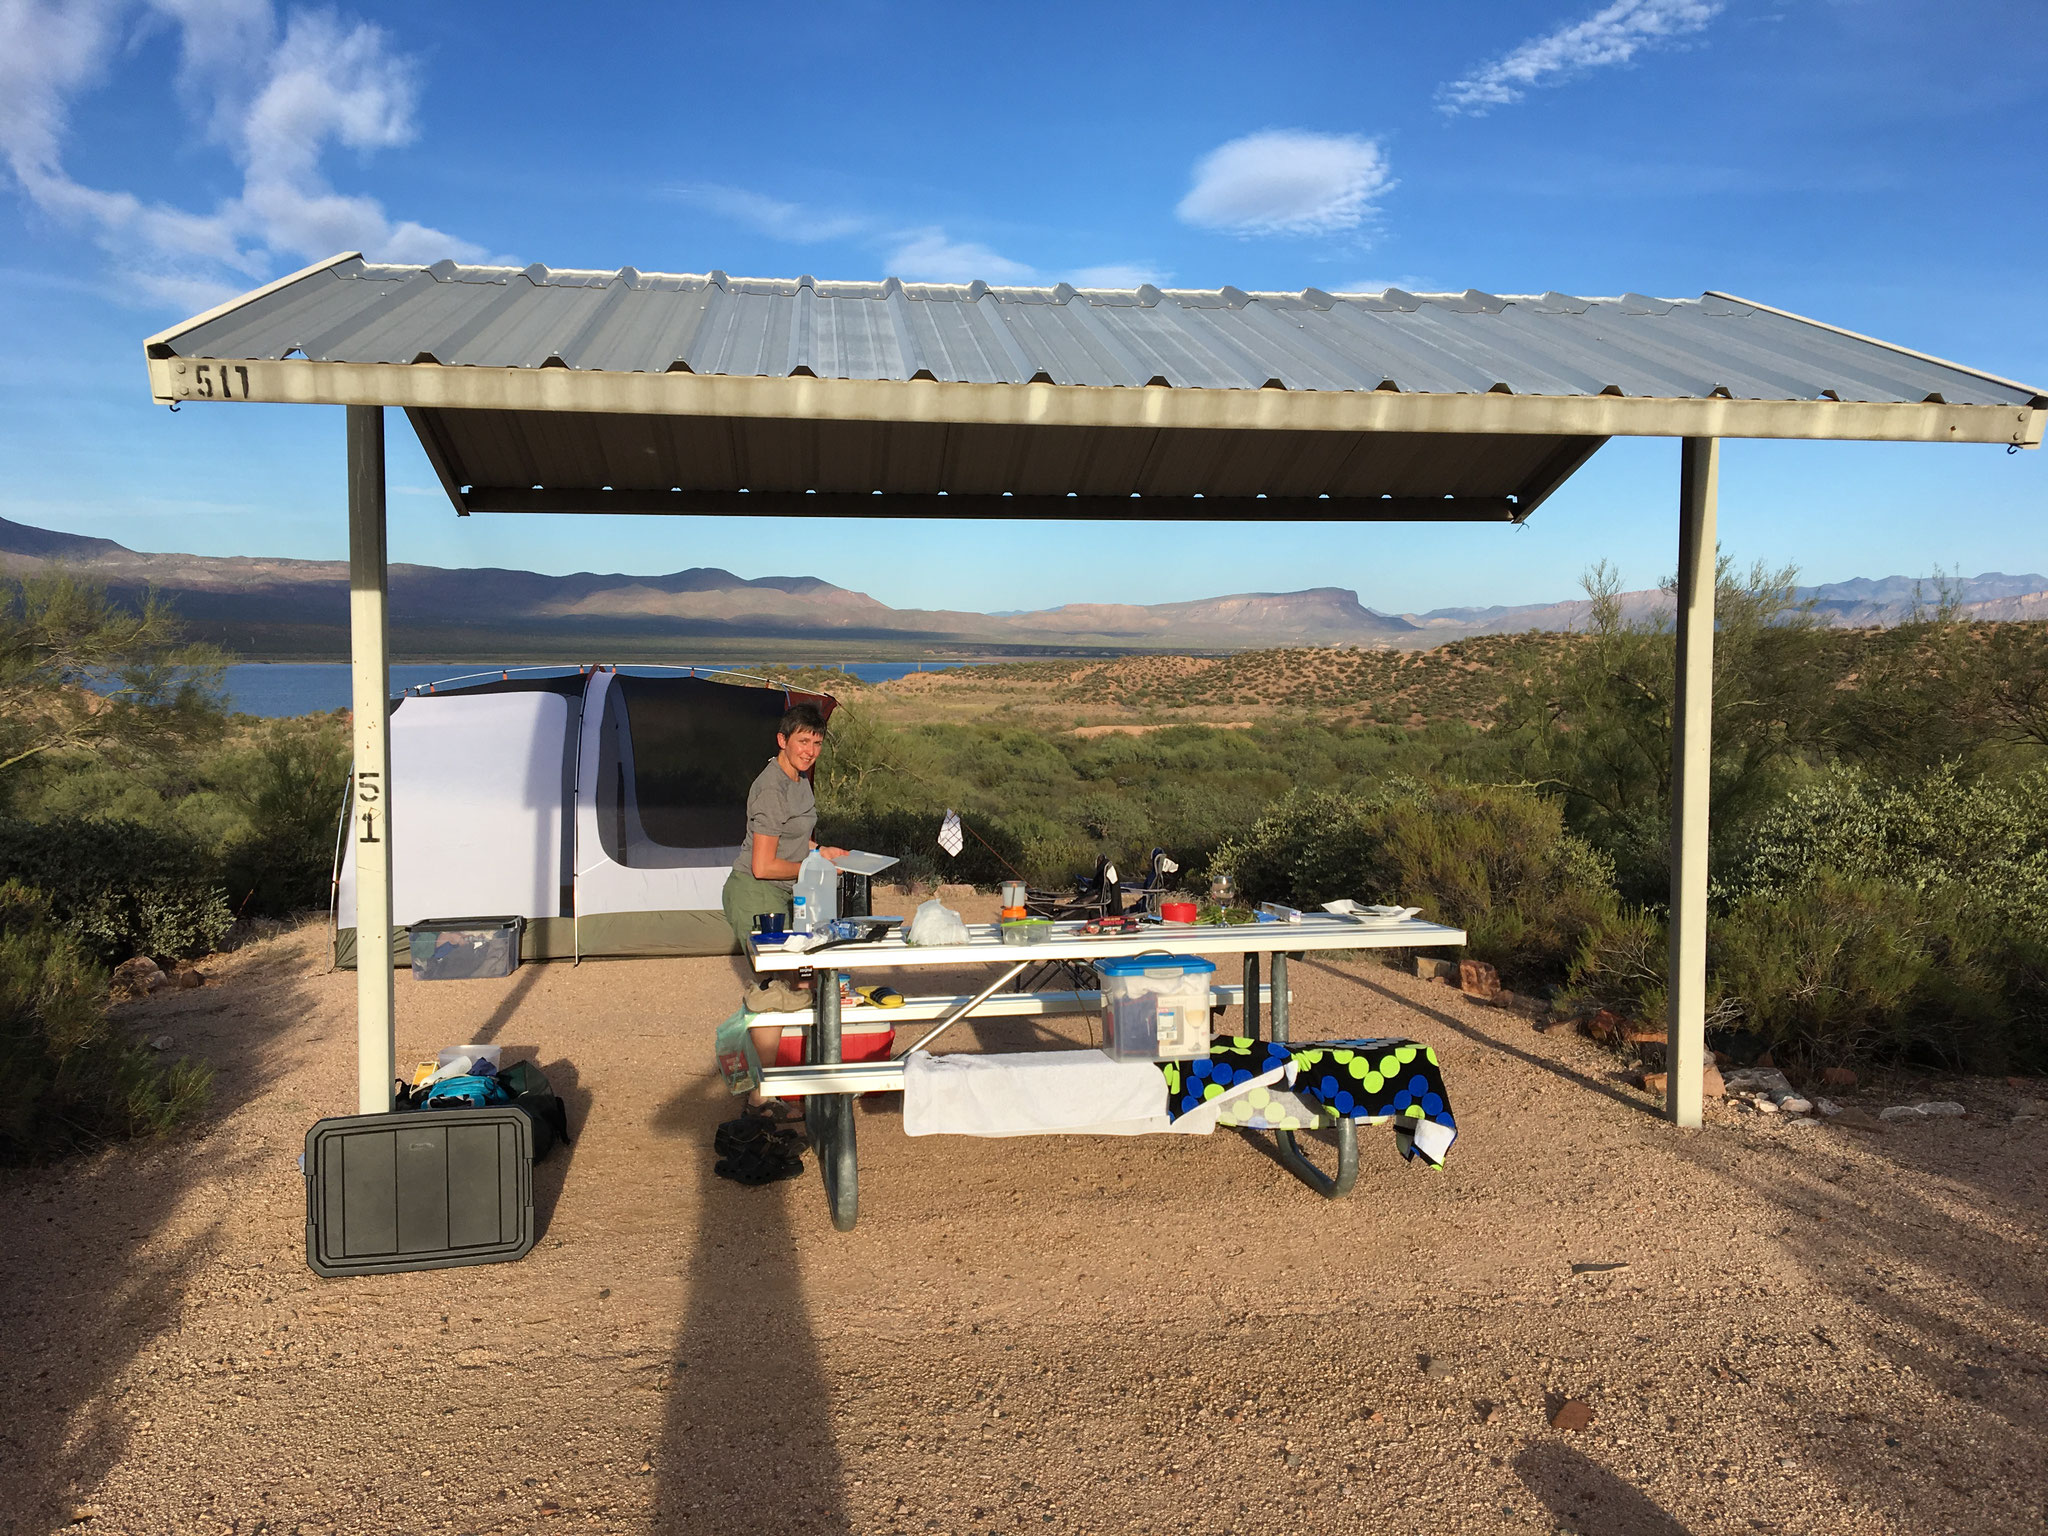 Windi Hills Campground Theodor Roosevelt Lake